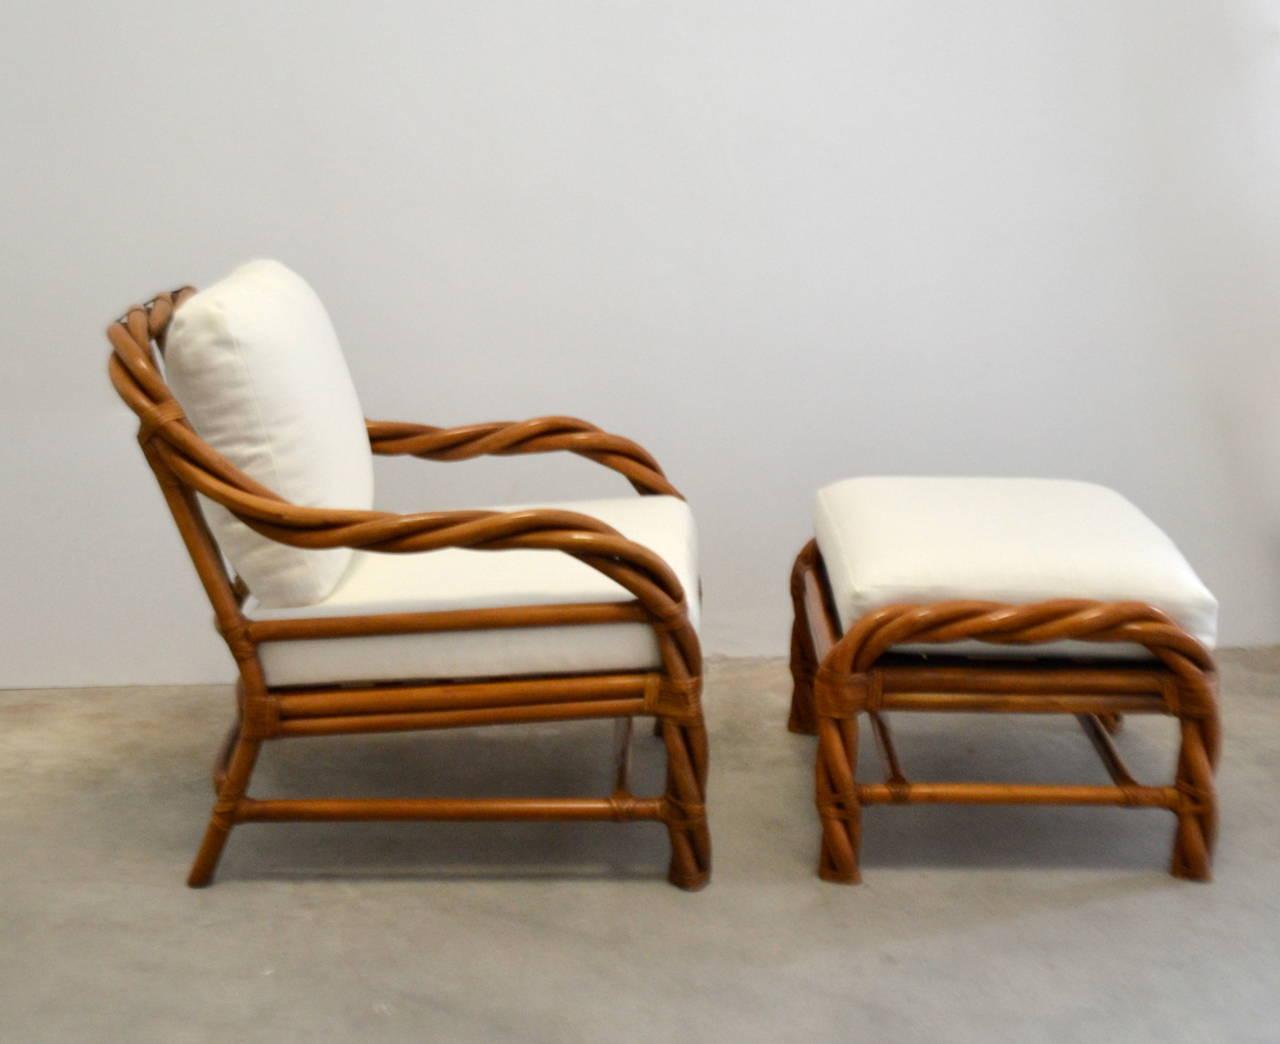 Rattan Club Chair And Ottoman At 1stdibs